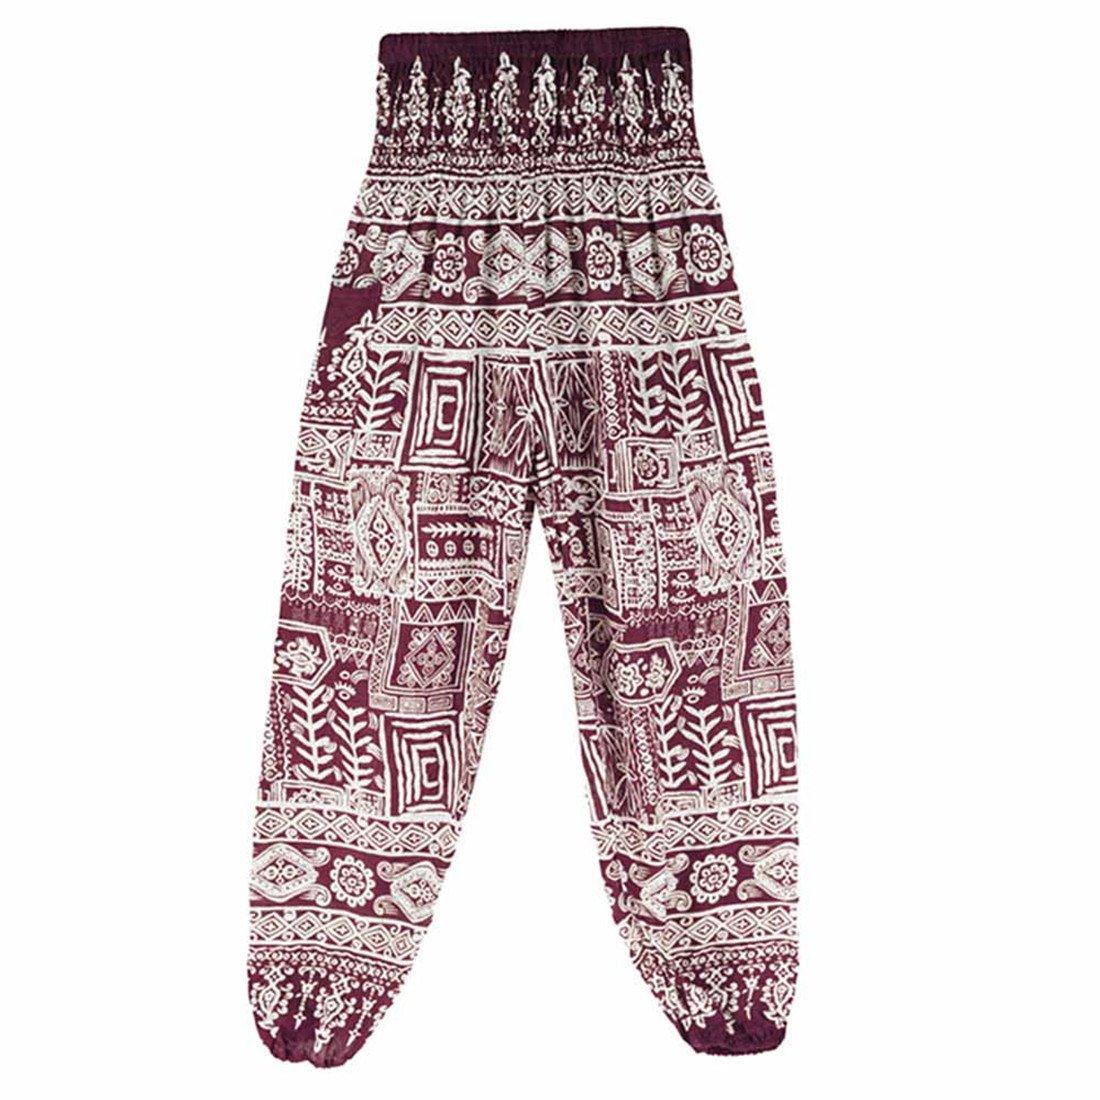 9d36bbe2a2e28f Womens Yoga Pants,YKA,Men Thai Harem Trousers Boho Festival Hippy Smock  High Waist Pants for Ladies - Purple - Free Size: Amazon.co.uk: Clothing